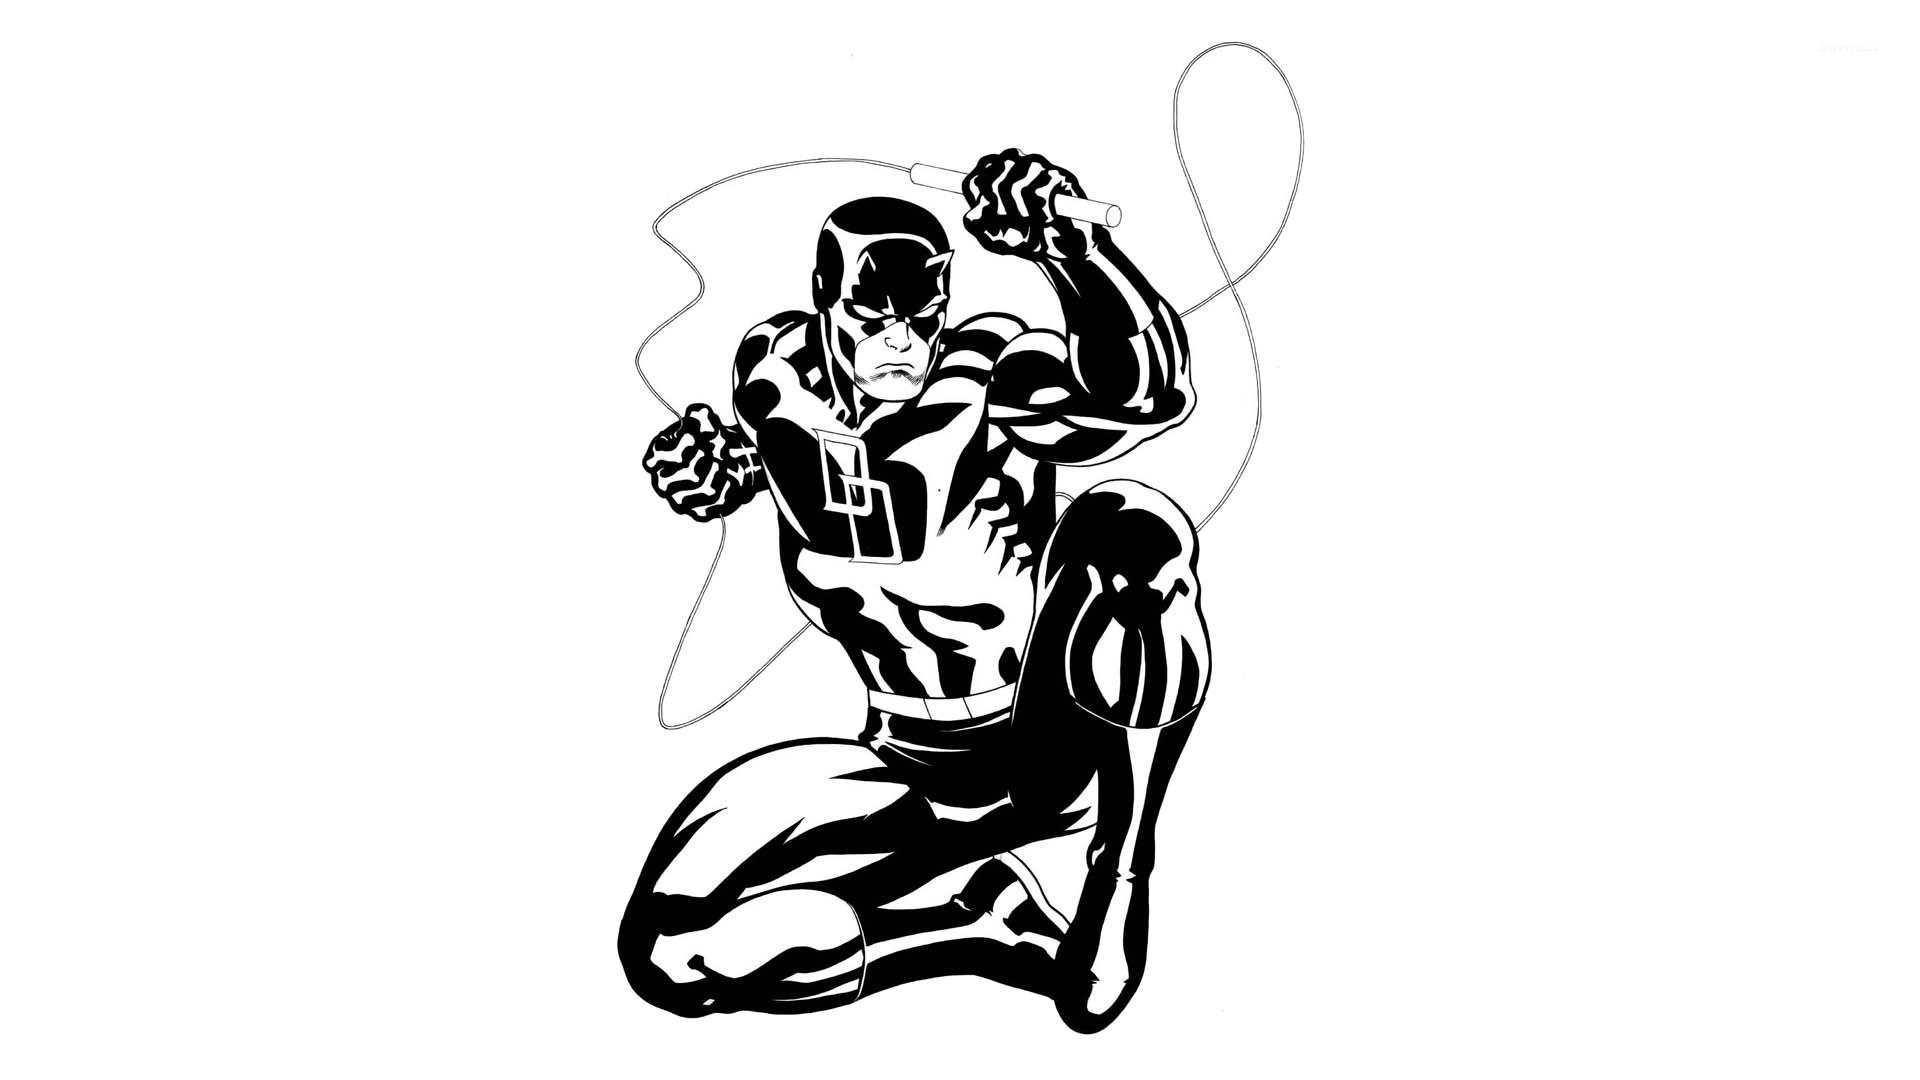 Black and white Daredevil wallpaper jpg